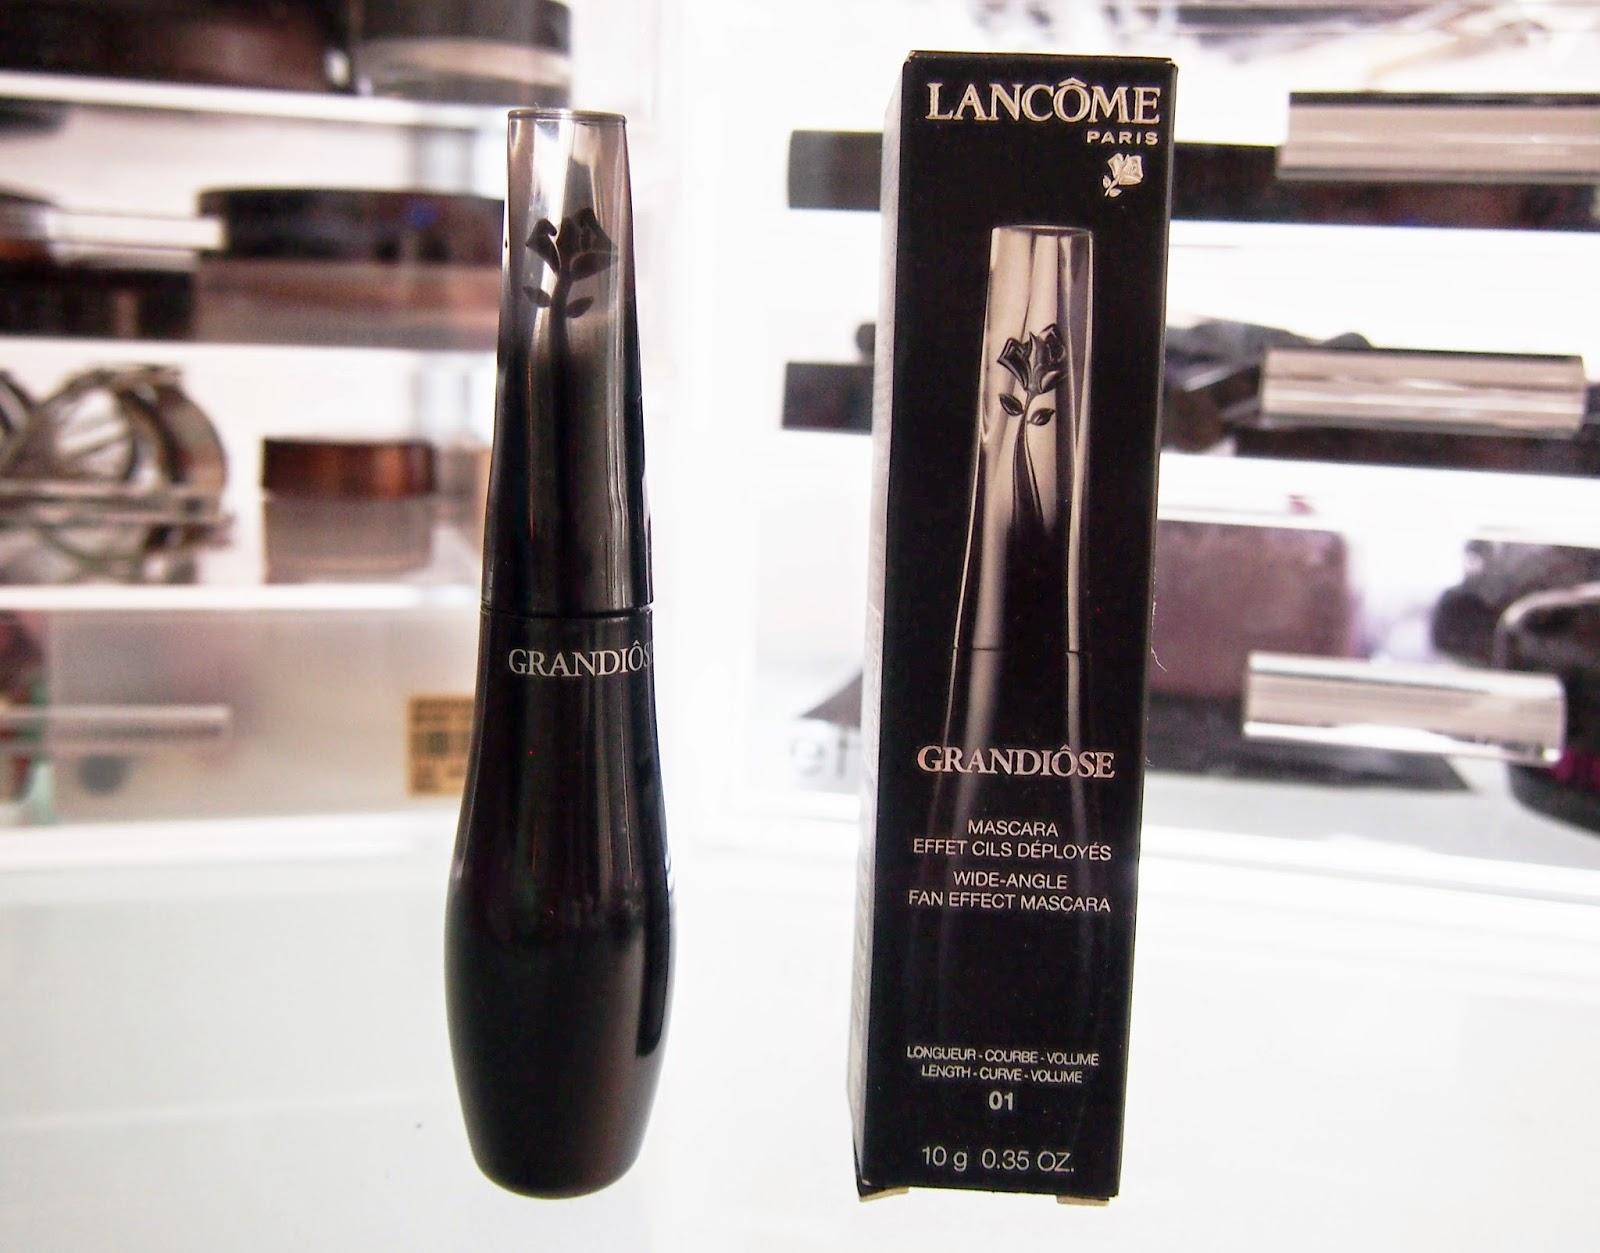 37a68ff22a6 Review: Lancome Grandiose Mascara. Lancome Grandiose Mascara has got to ...